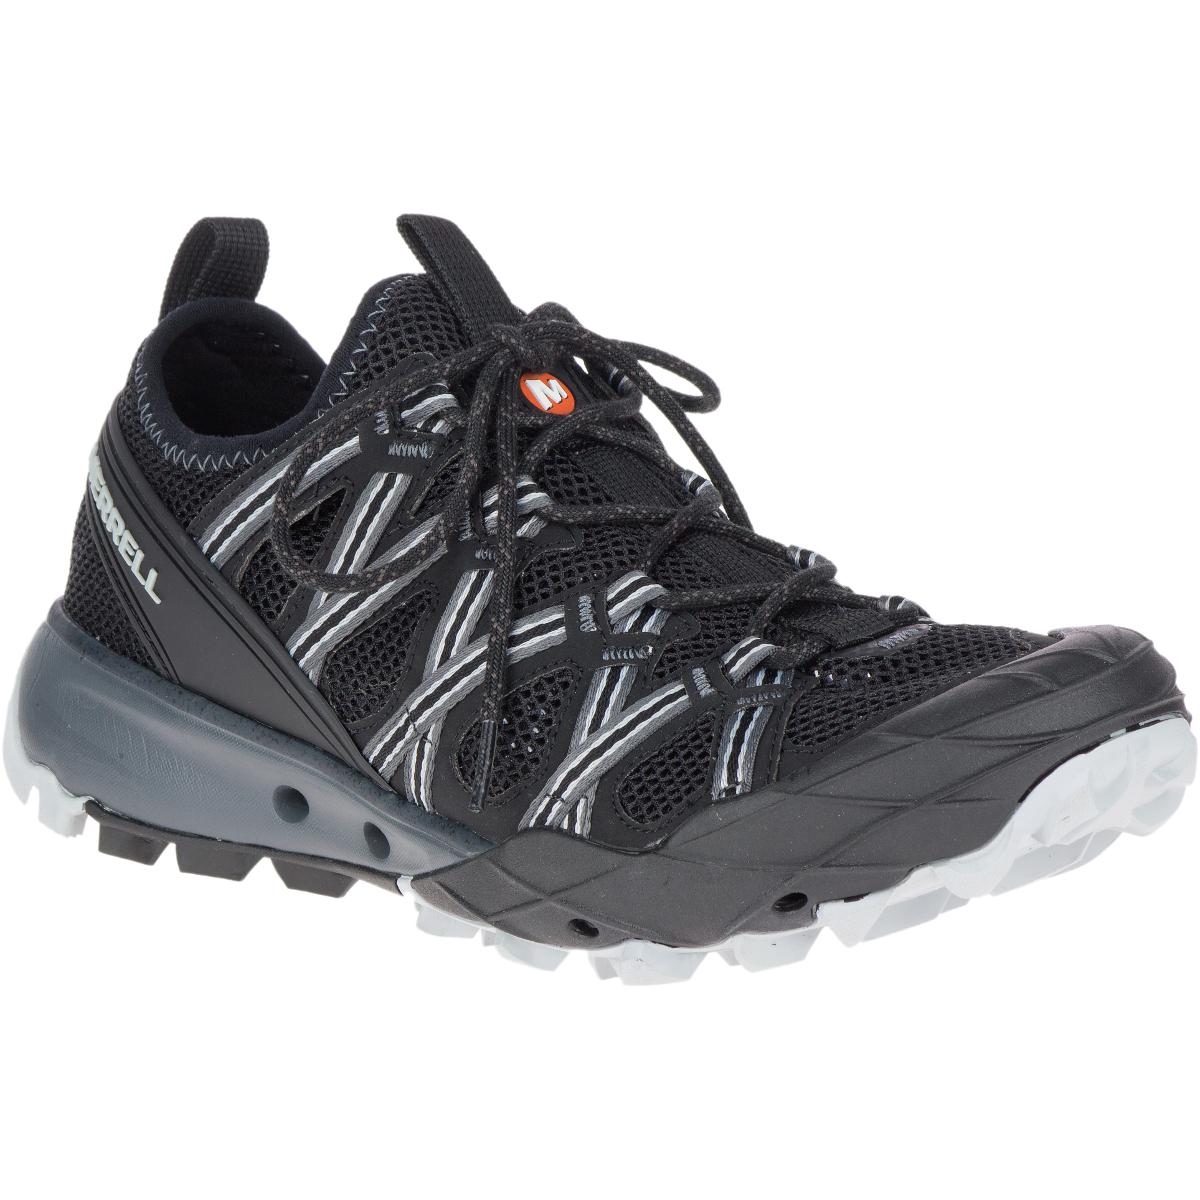 Merrell Men's Choprock Hiking Shoe - Black, 13